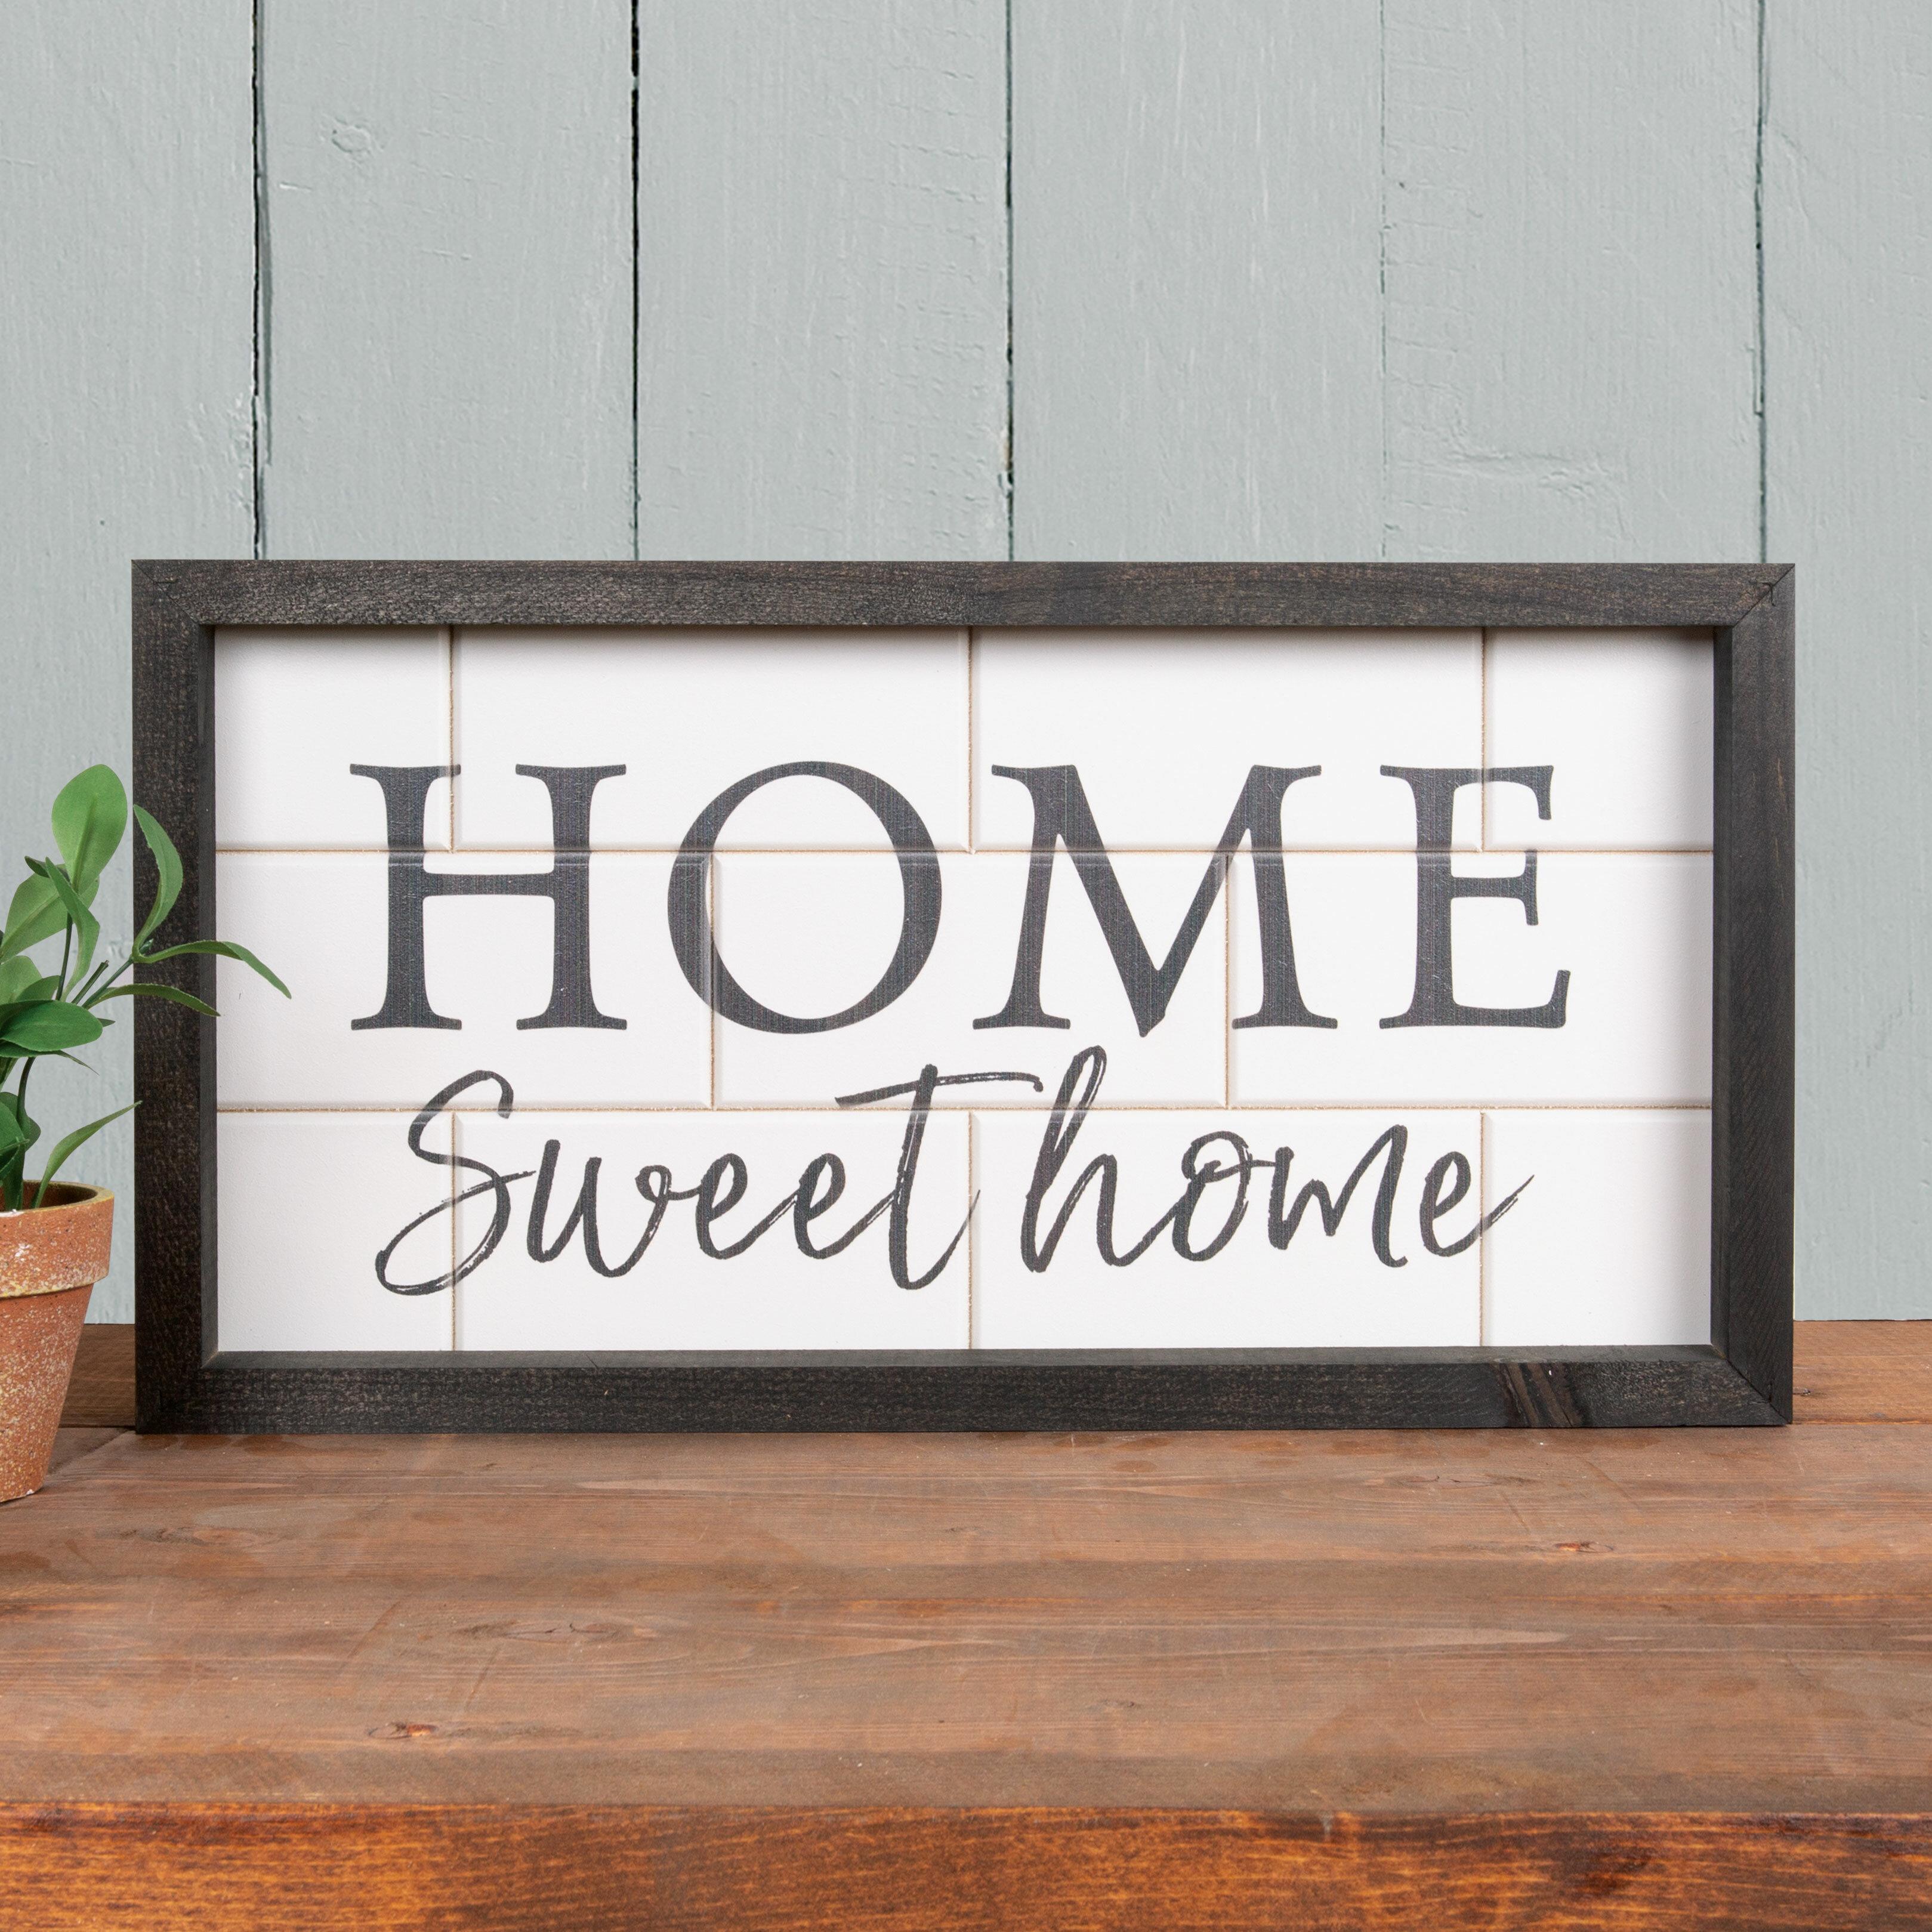 Home Sweet Home Wall Decor   Wayfair For Laser Engraved Home Sweet Home Wall Decor (View 12 of 30)